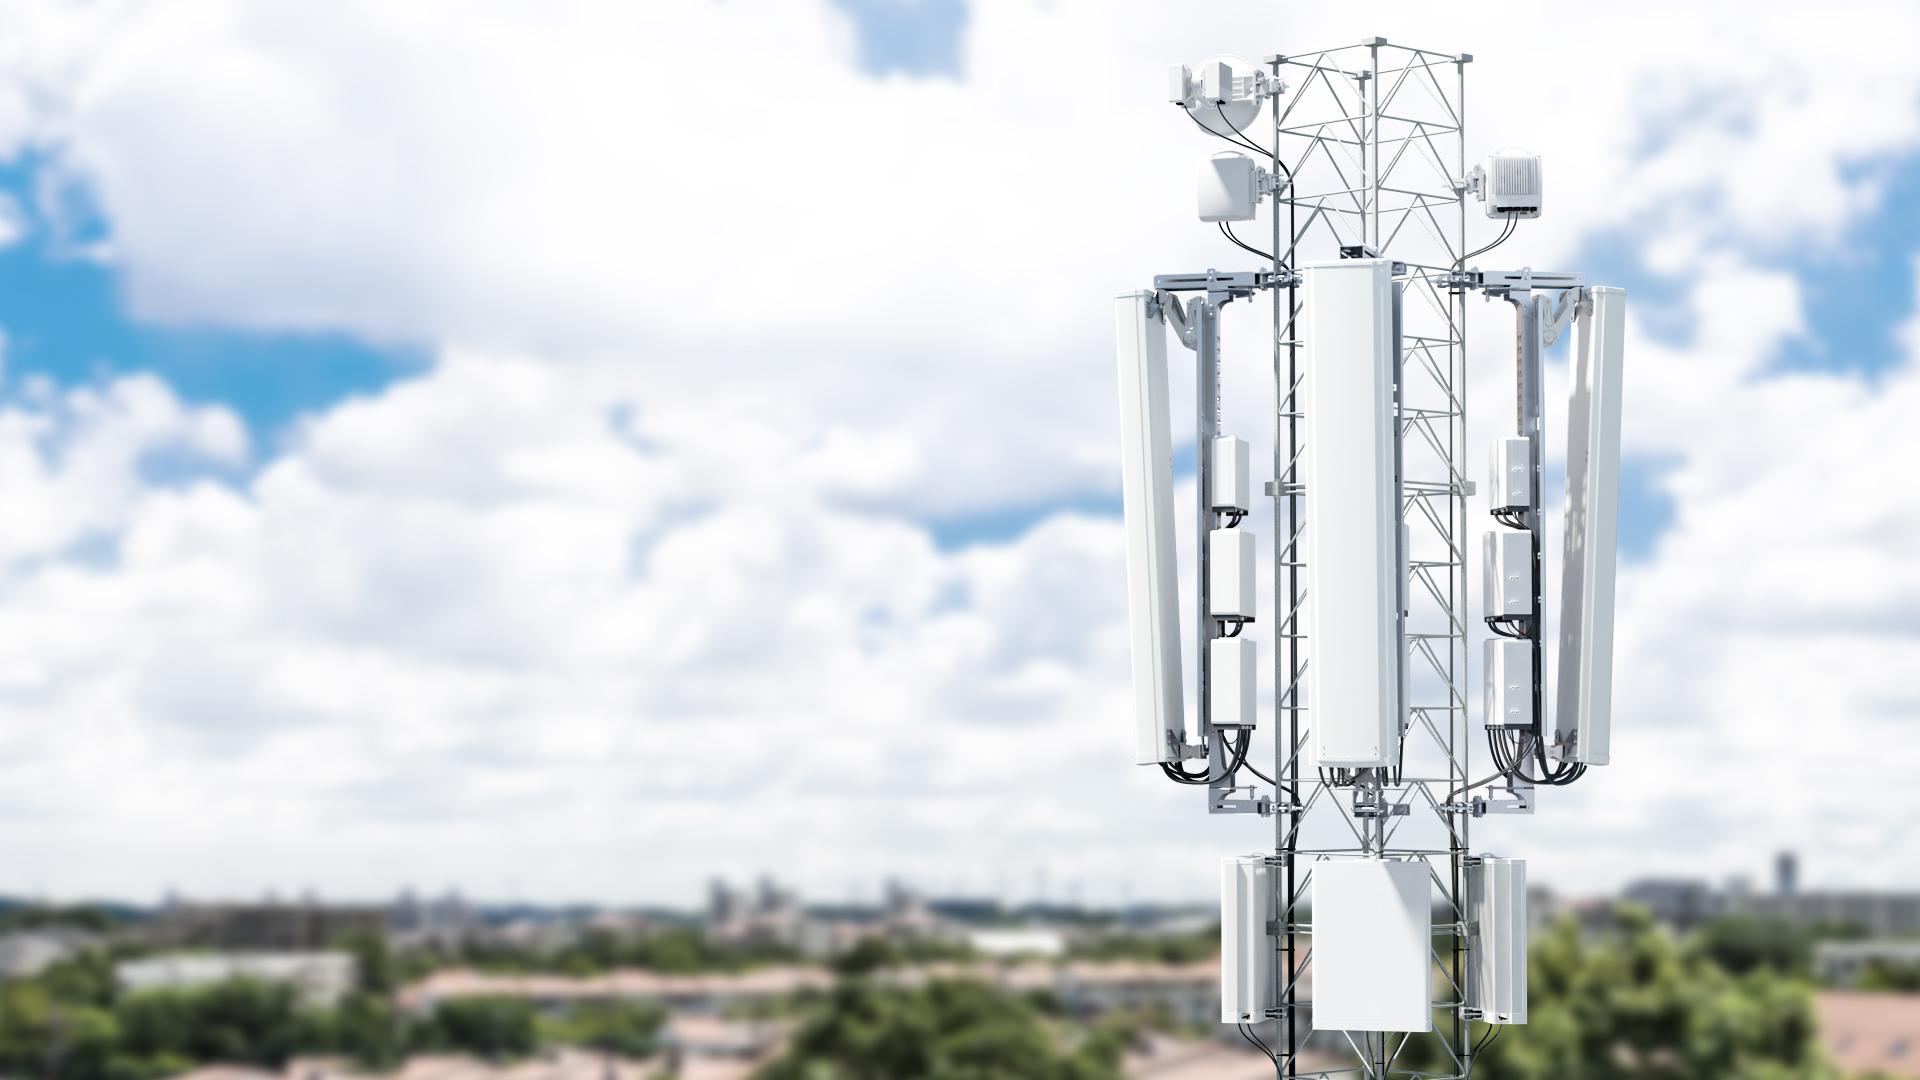 ericsson-suburban-mast-d-5g-high